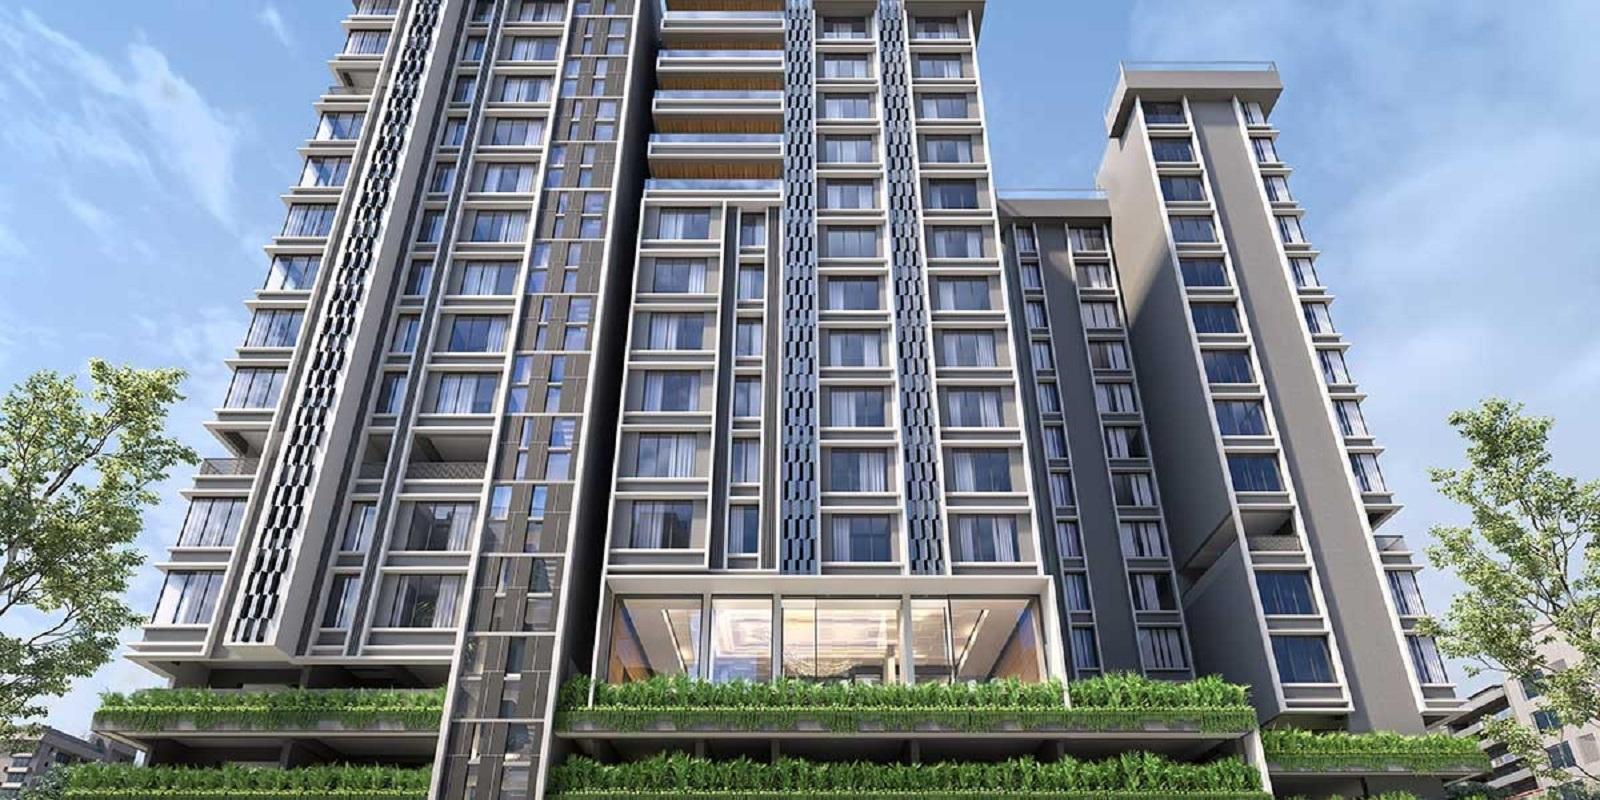 s raheja new light project project large image1